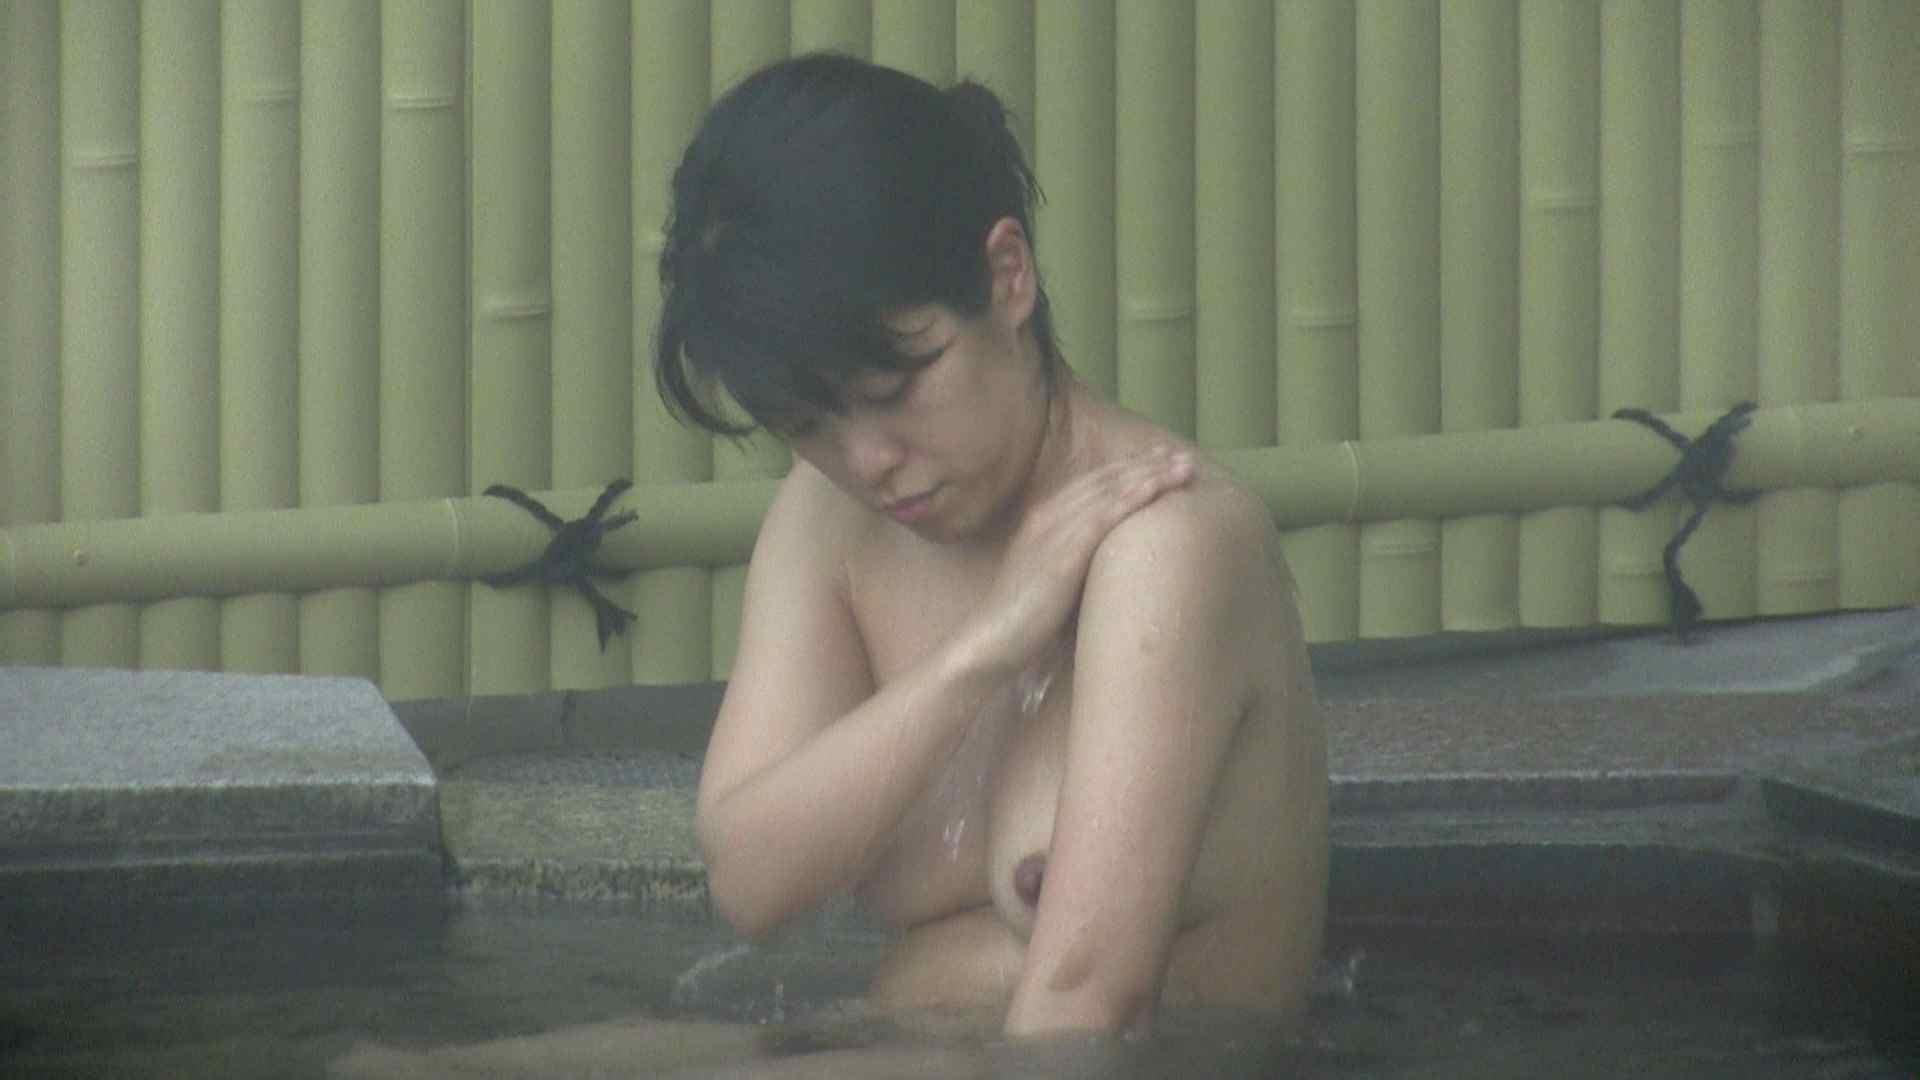 Aquaな露天風呂Vol.585 HなOL | 盗撮  93pic 67